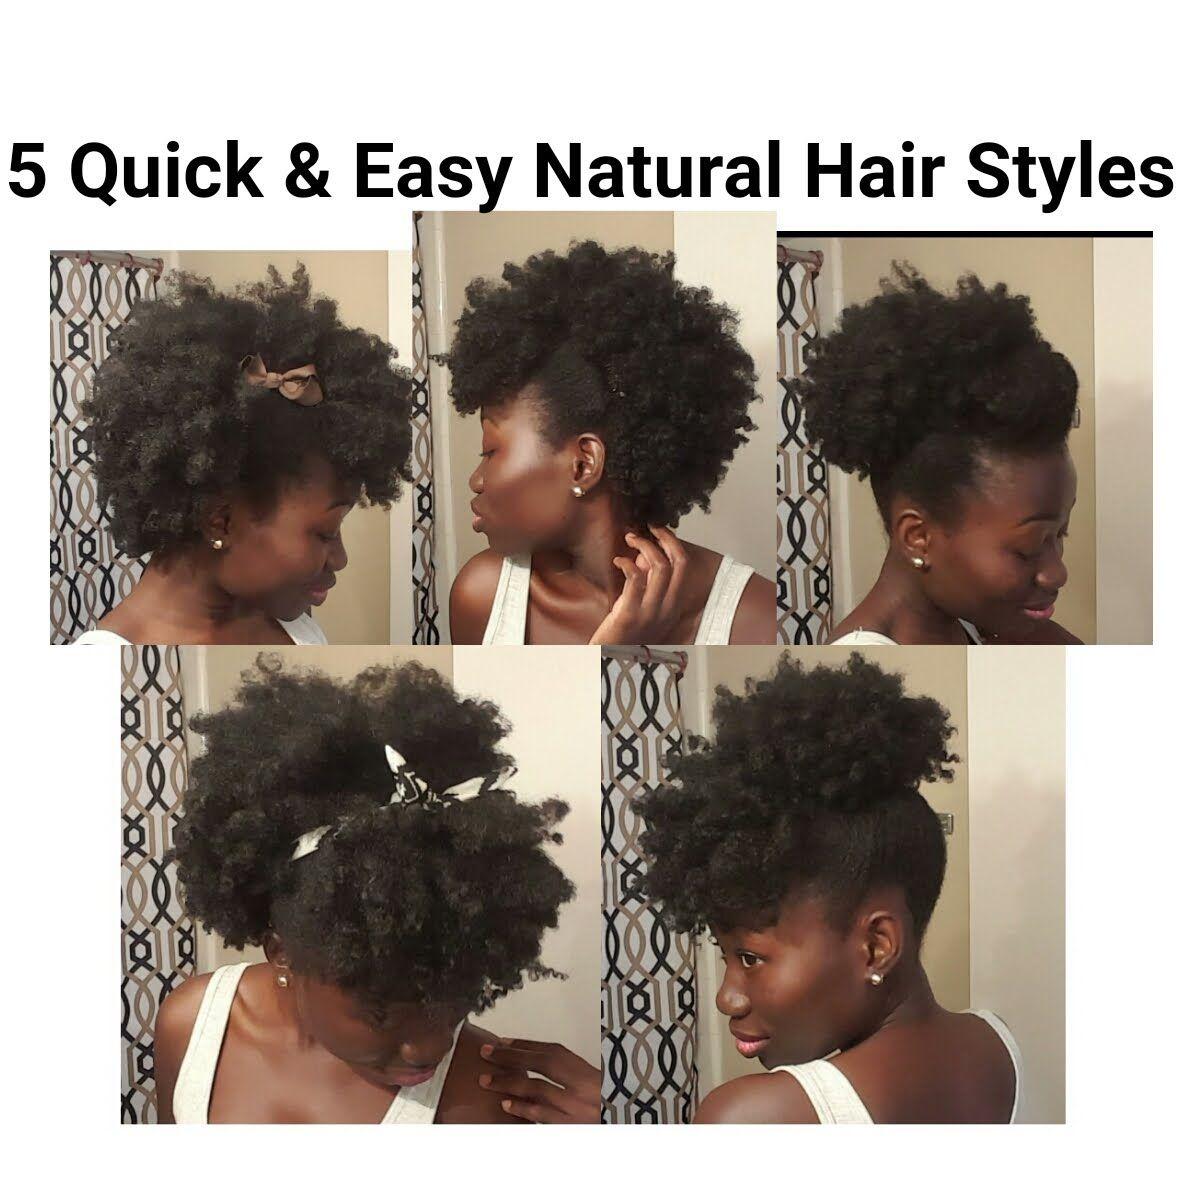 Simple Hairstyles For Natural N Hair : Quick easy natural hair styles short medium length